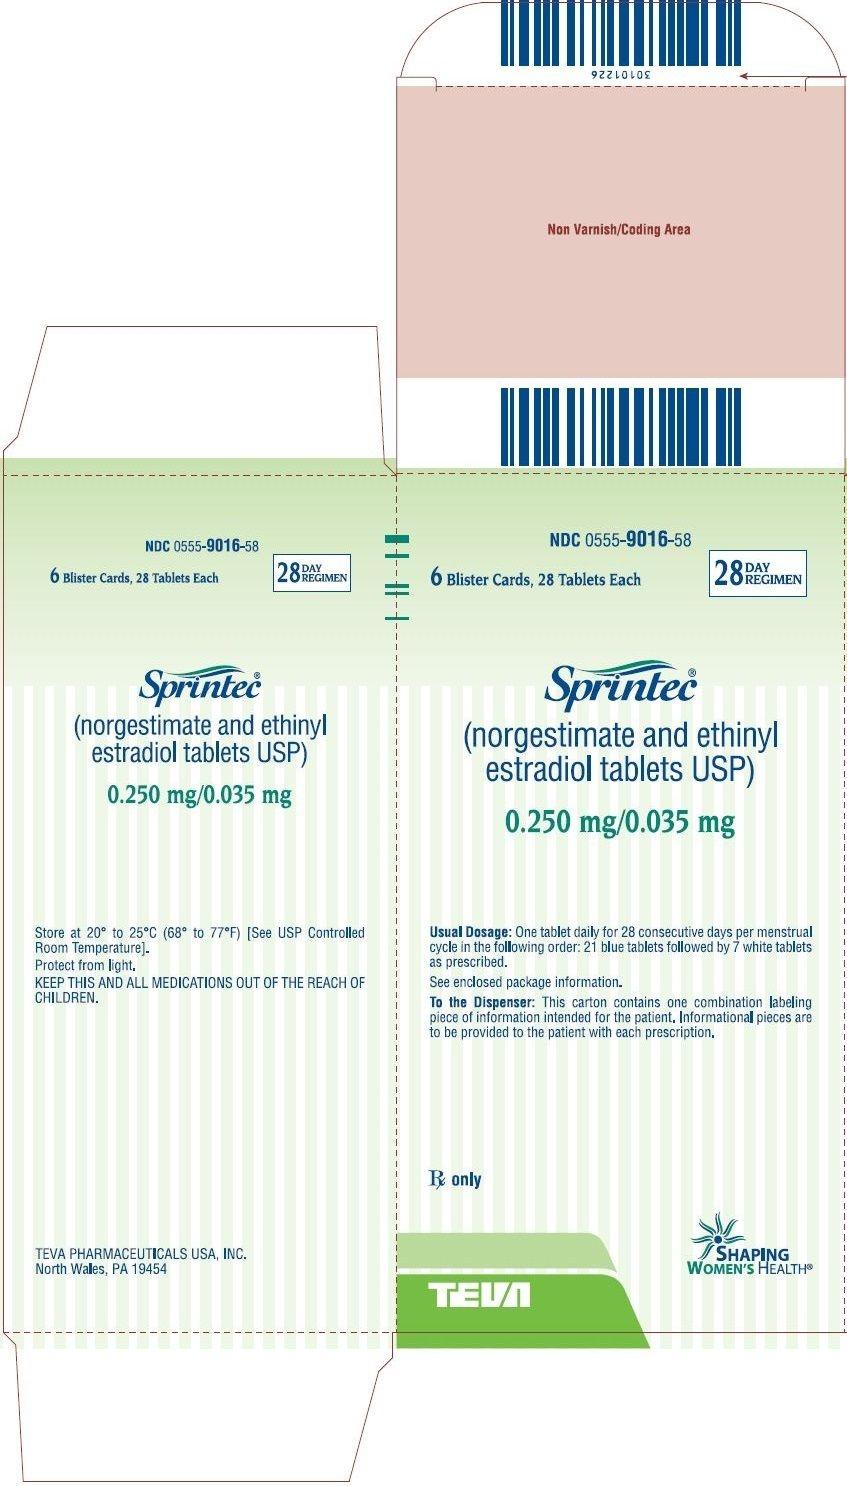 Sprintec - Fda Prescribing Information, Side Effects And Uses